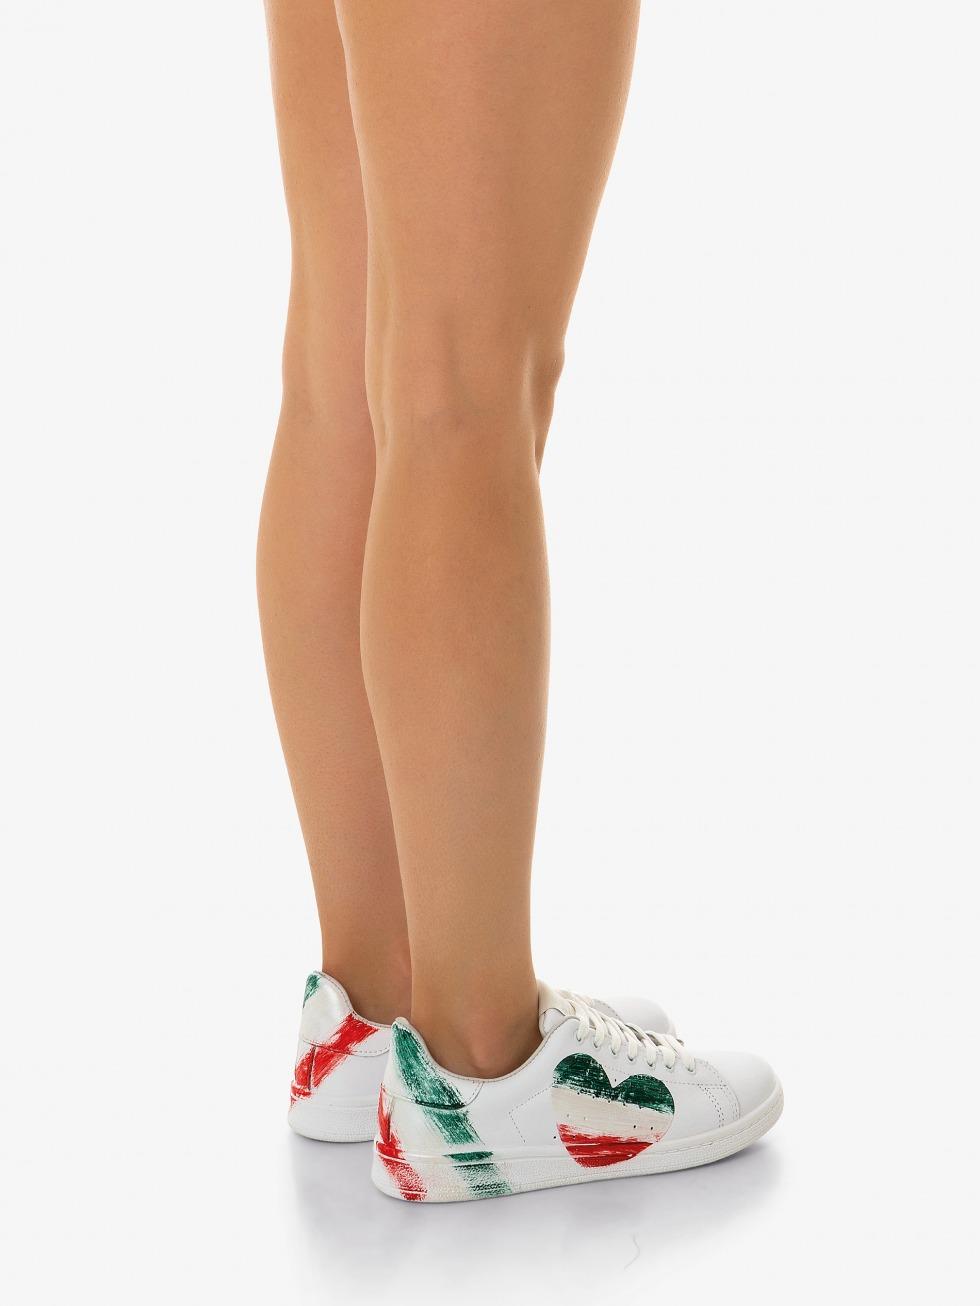 Sneakers Daiquiri Bianco - Cuore Flag Italy